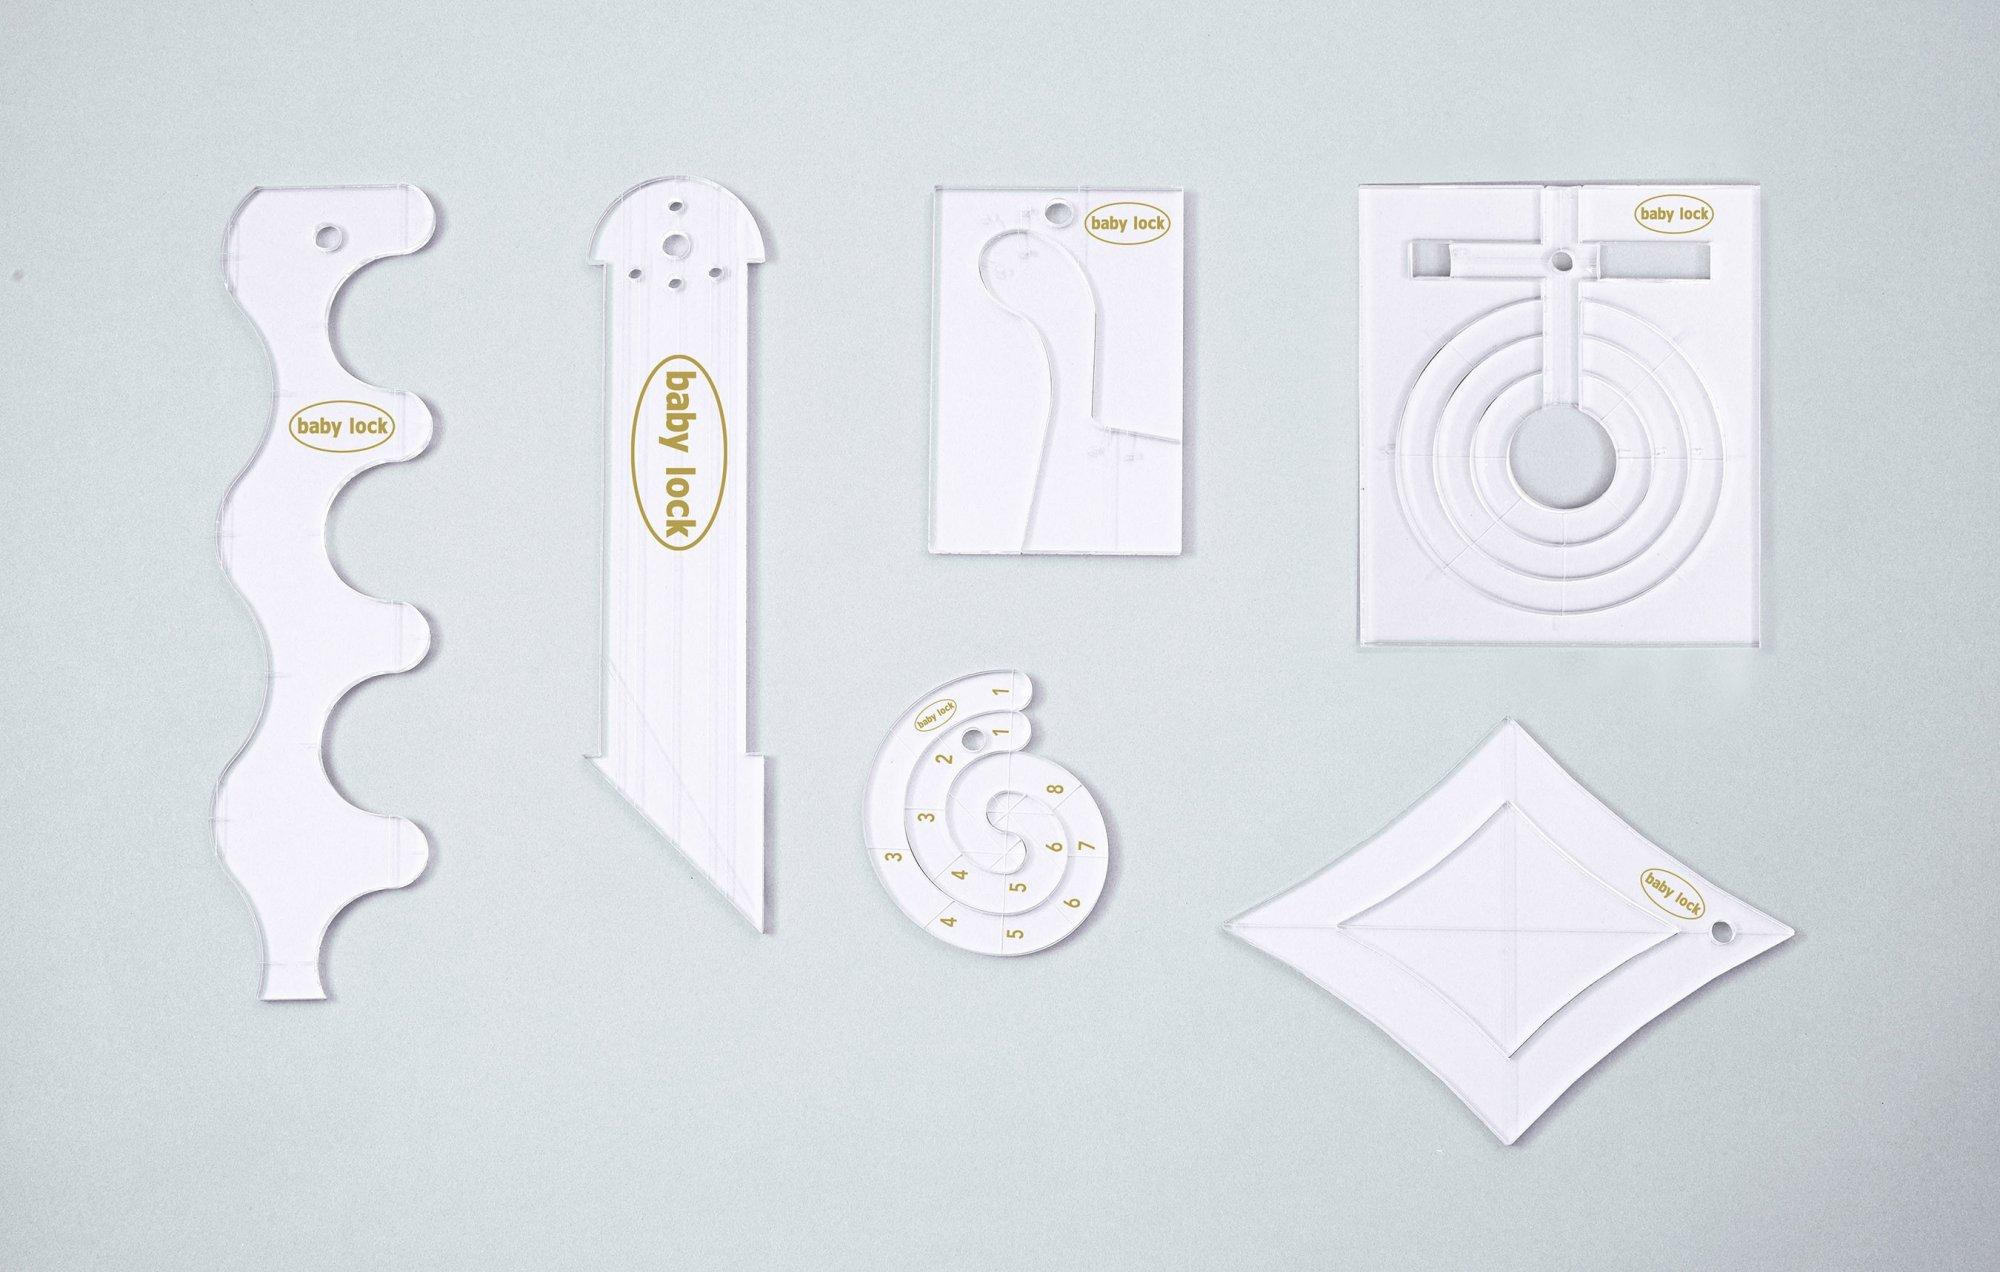 1/4 Acrylic Ruler Set - High Shank & Longarm